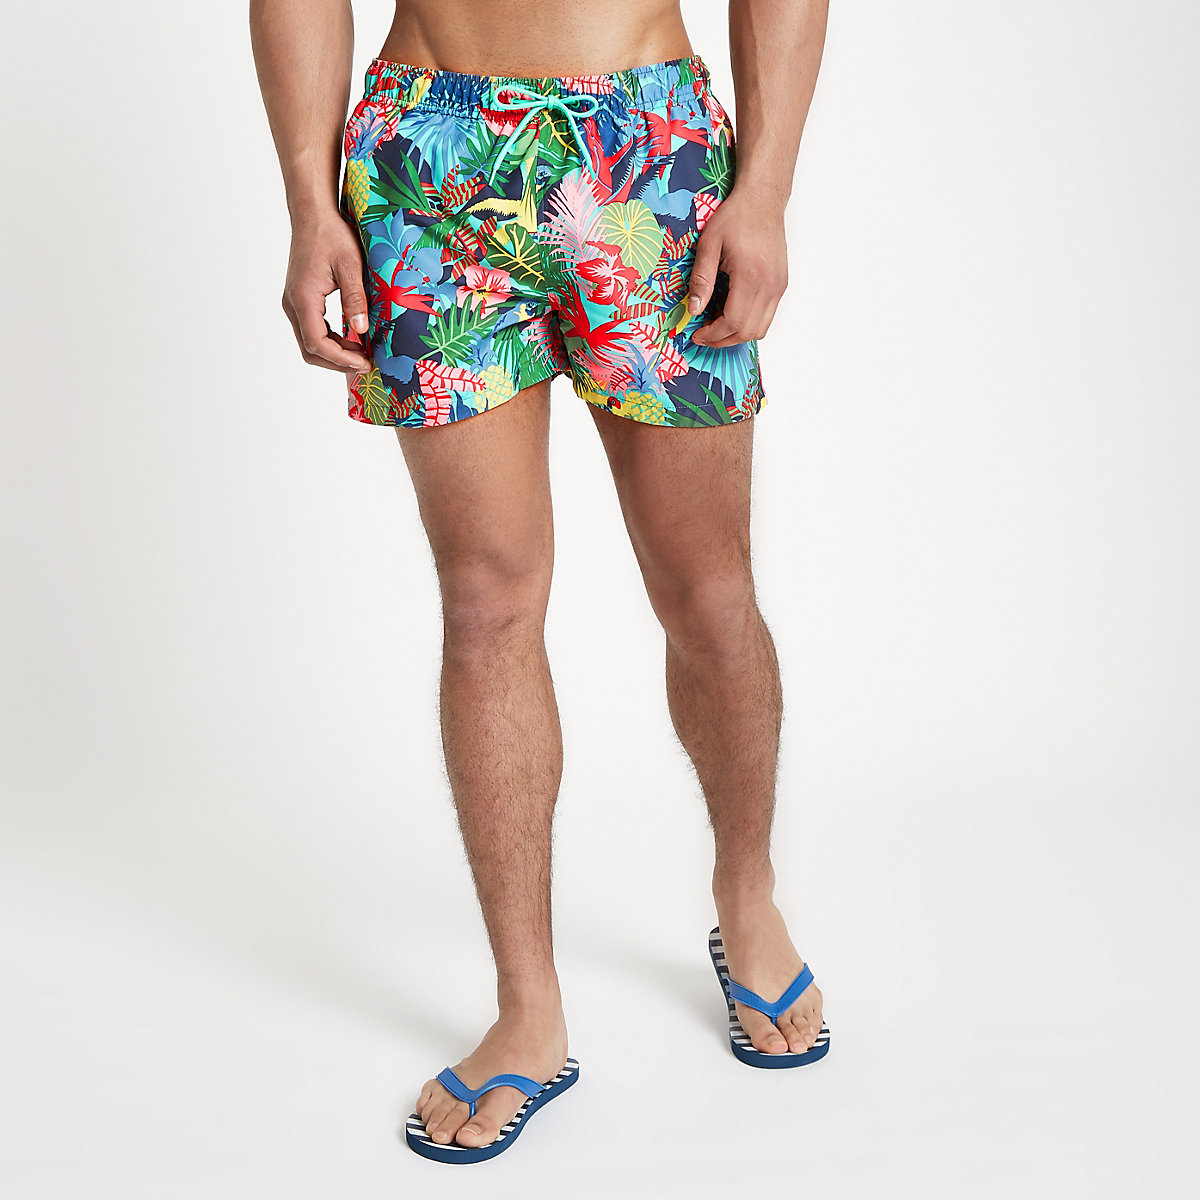 Green jungle print short swim shorts